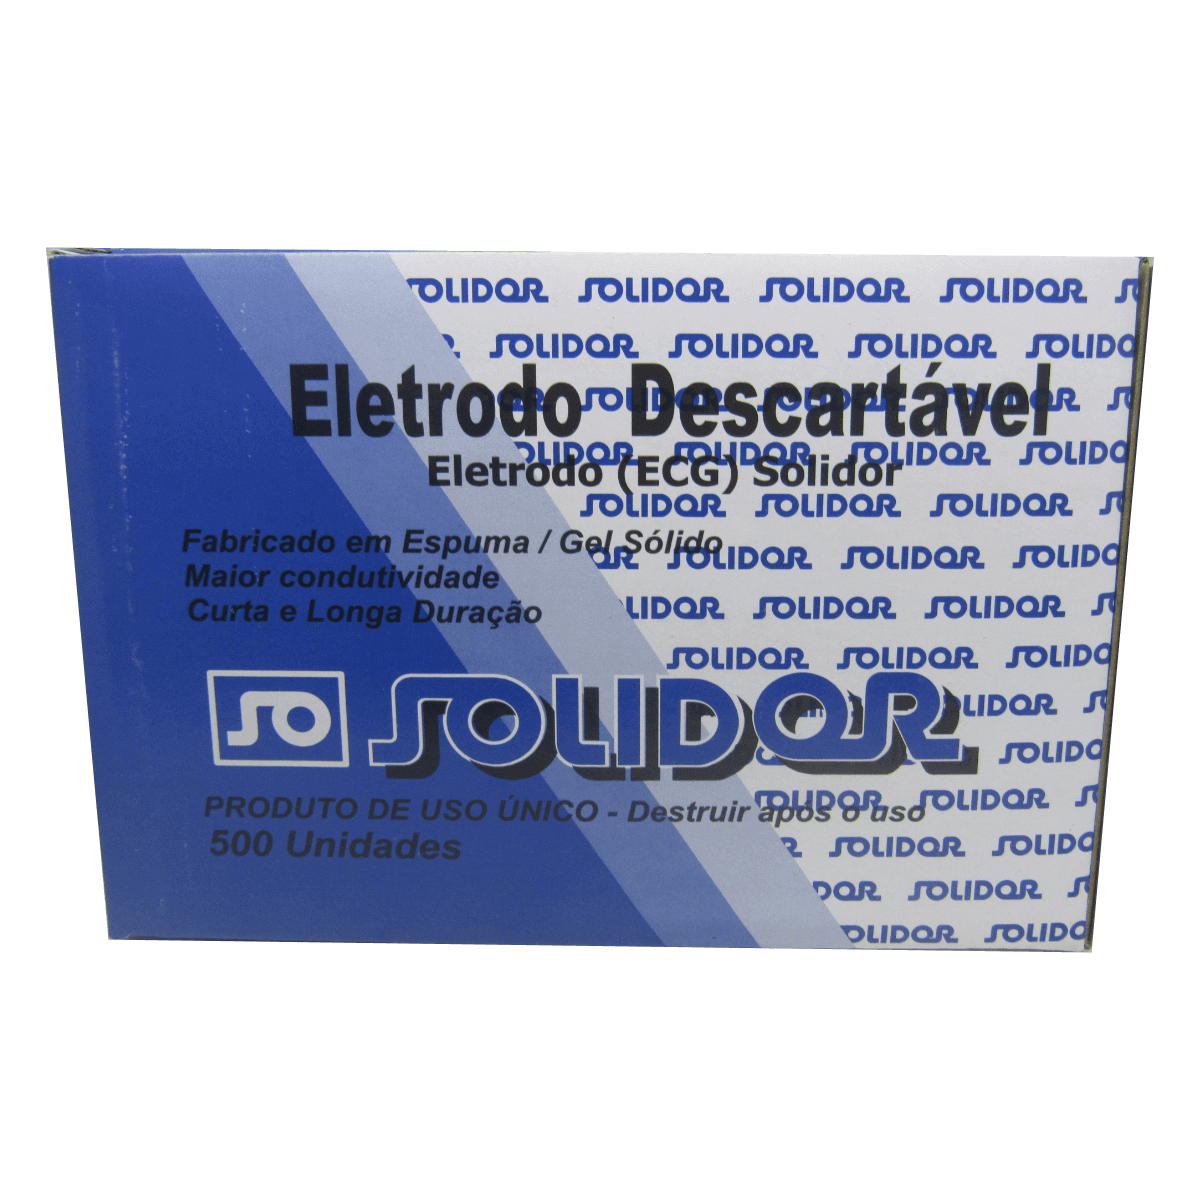 Eletrodo Descartável Eletrocardiograma ECG 500un Solidor